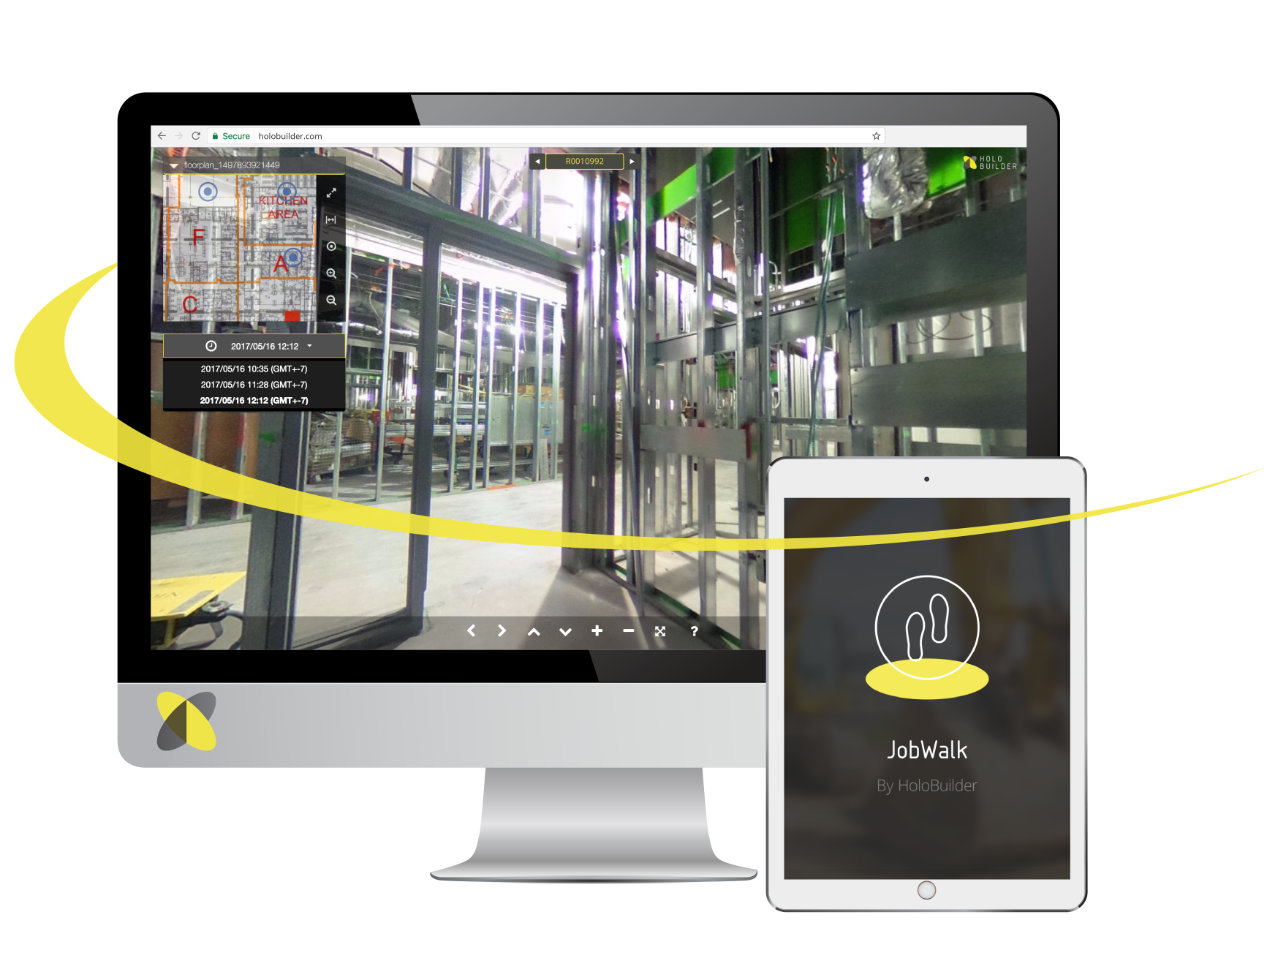 HoloBuilder enables construction teams to capture & share 360° virtual jobwalks